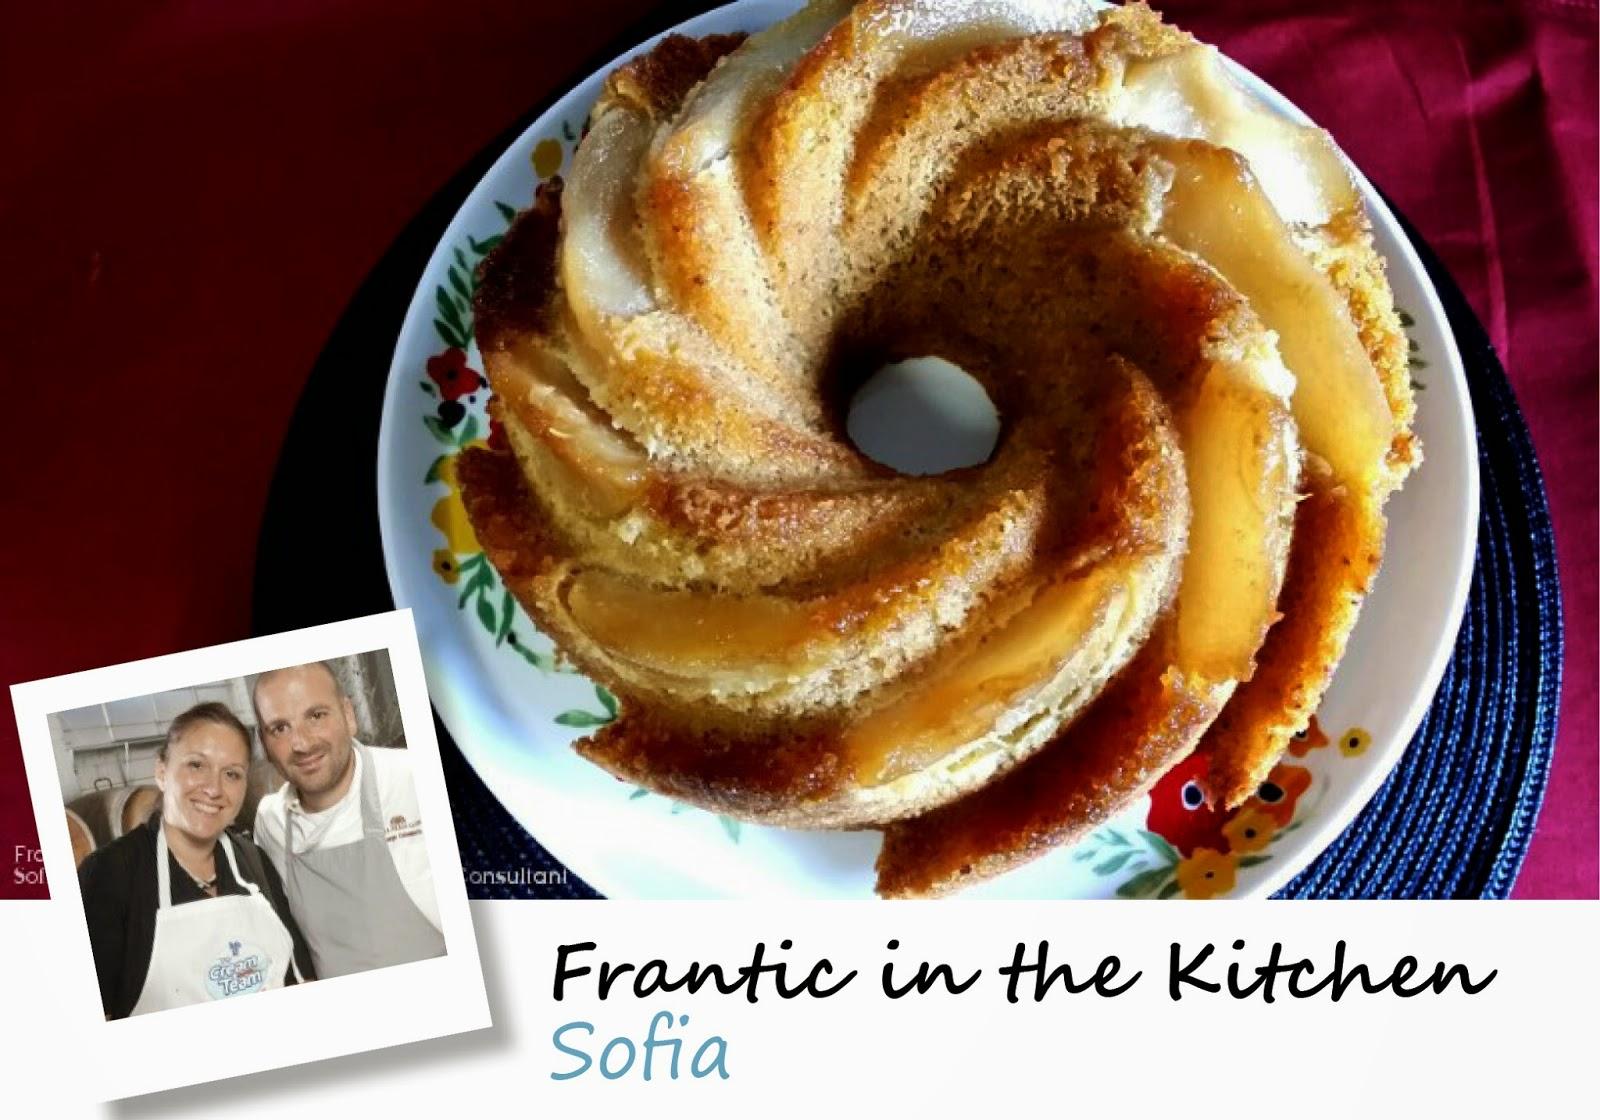 Sofia - Frantic in the Kitchen